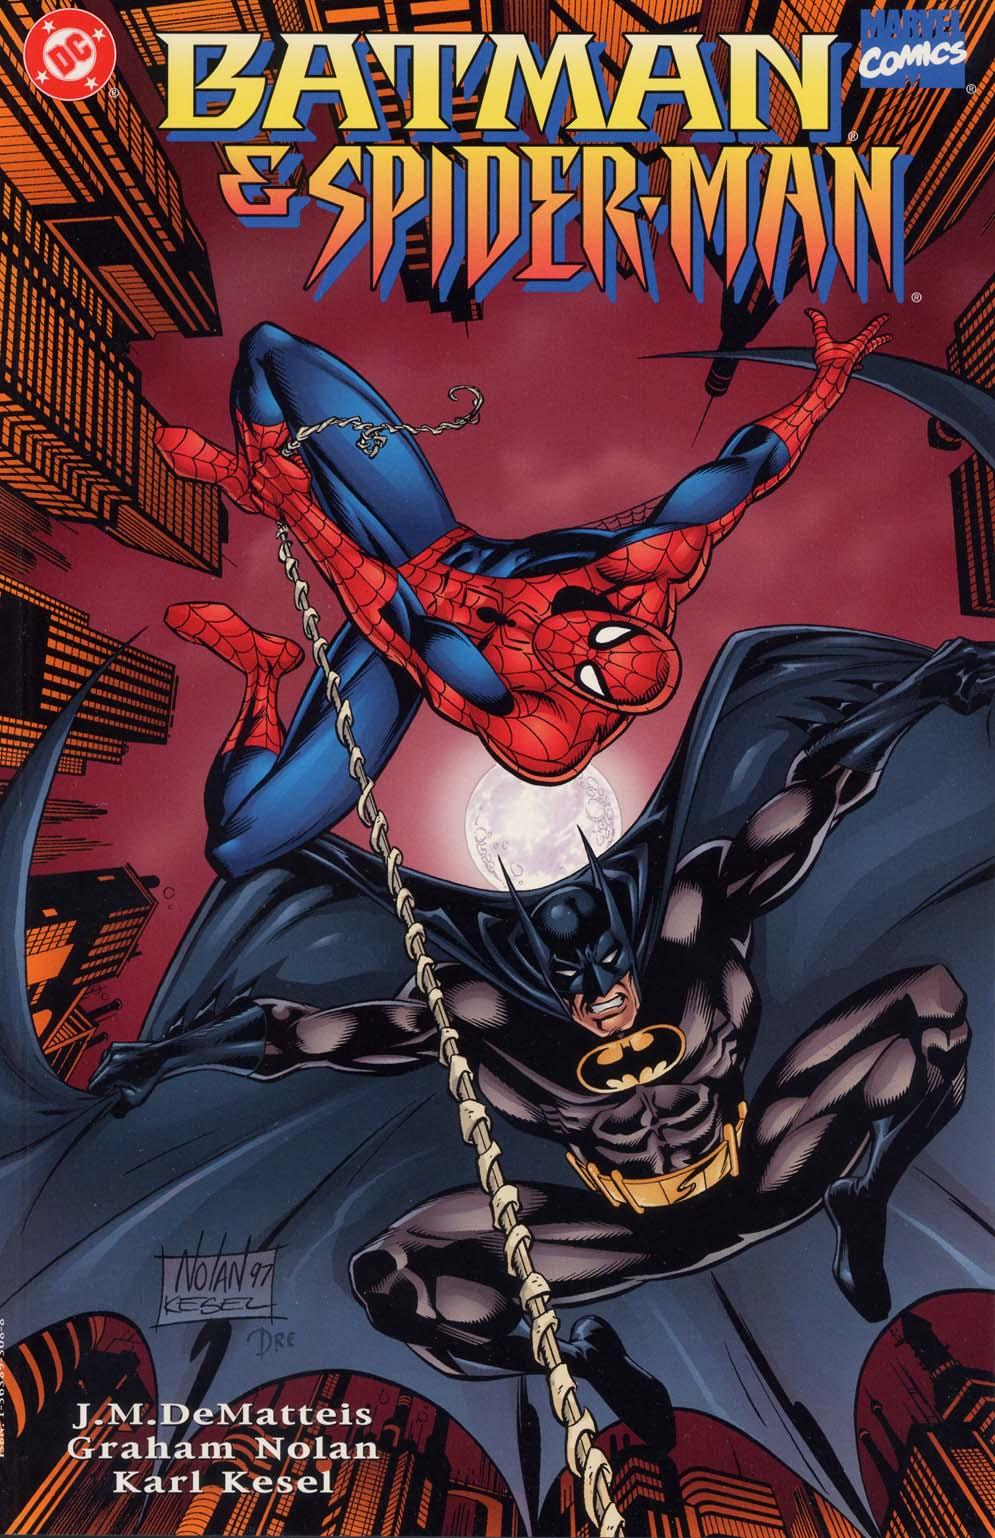 Batman/Spider-Man Full Page 1